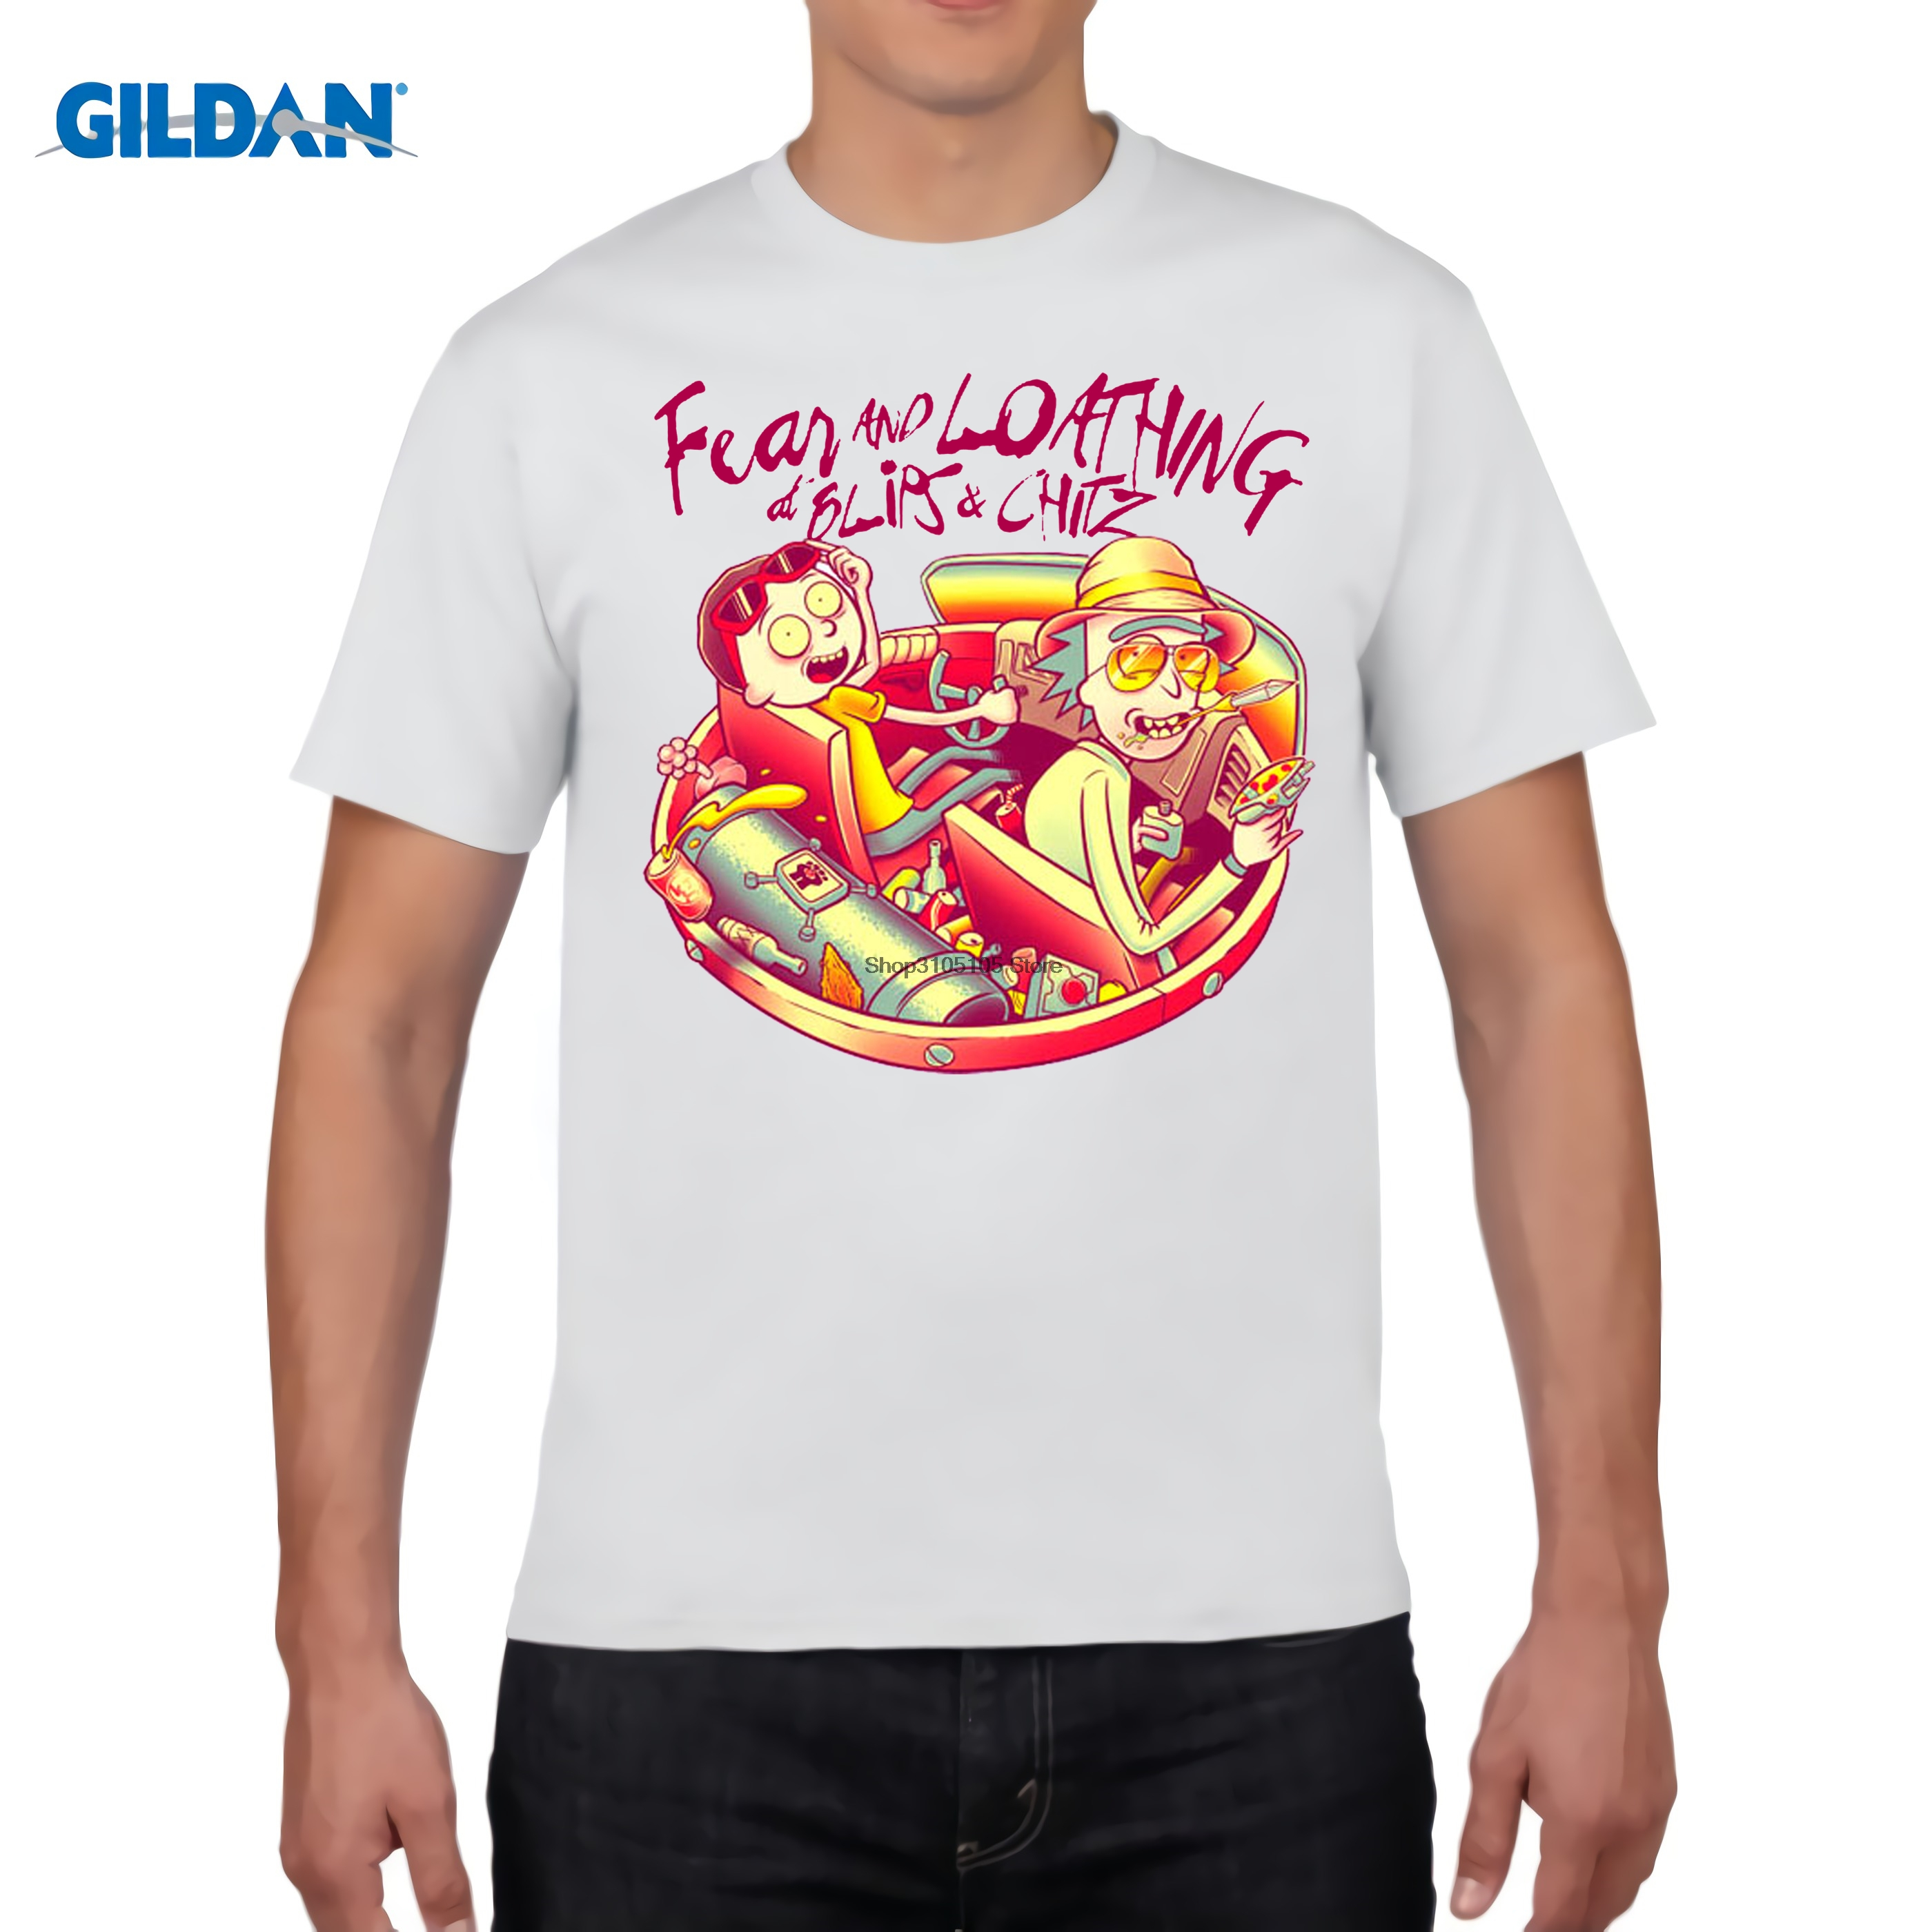 Ri And Morty Fear & Loading At Blips & Chitz T-shirt Schwift Las Vegas Tee E17 Free Shipping Harajuku Tops T Shirt Fashion T-shirts Men's Clothing